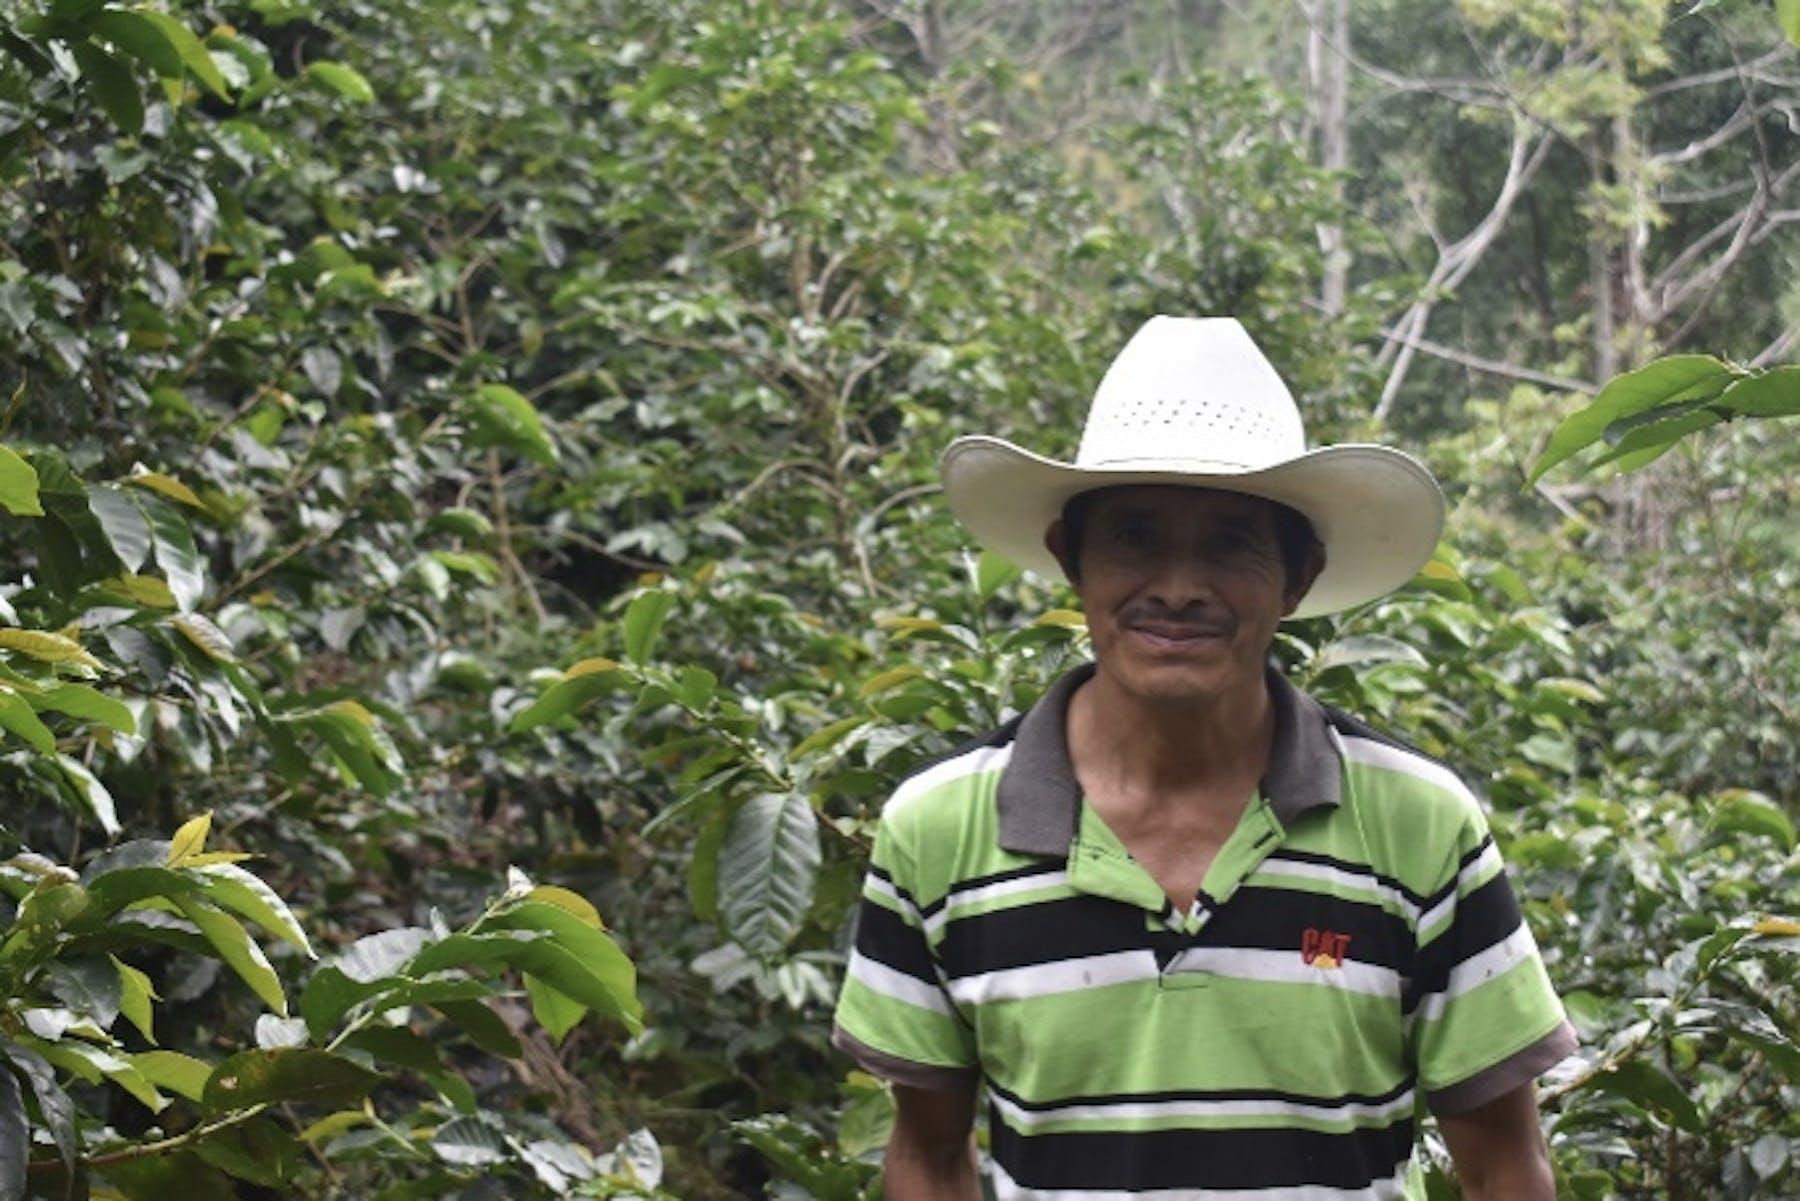 Jose Efrain